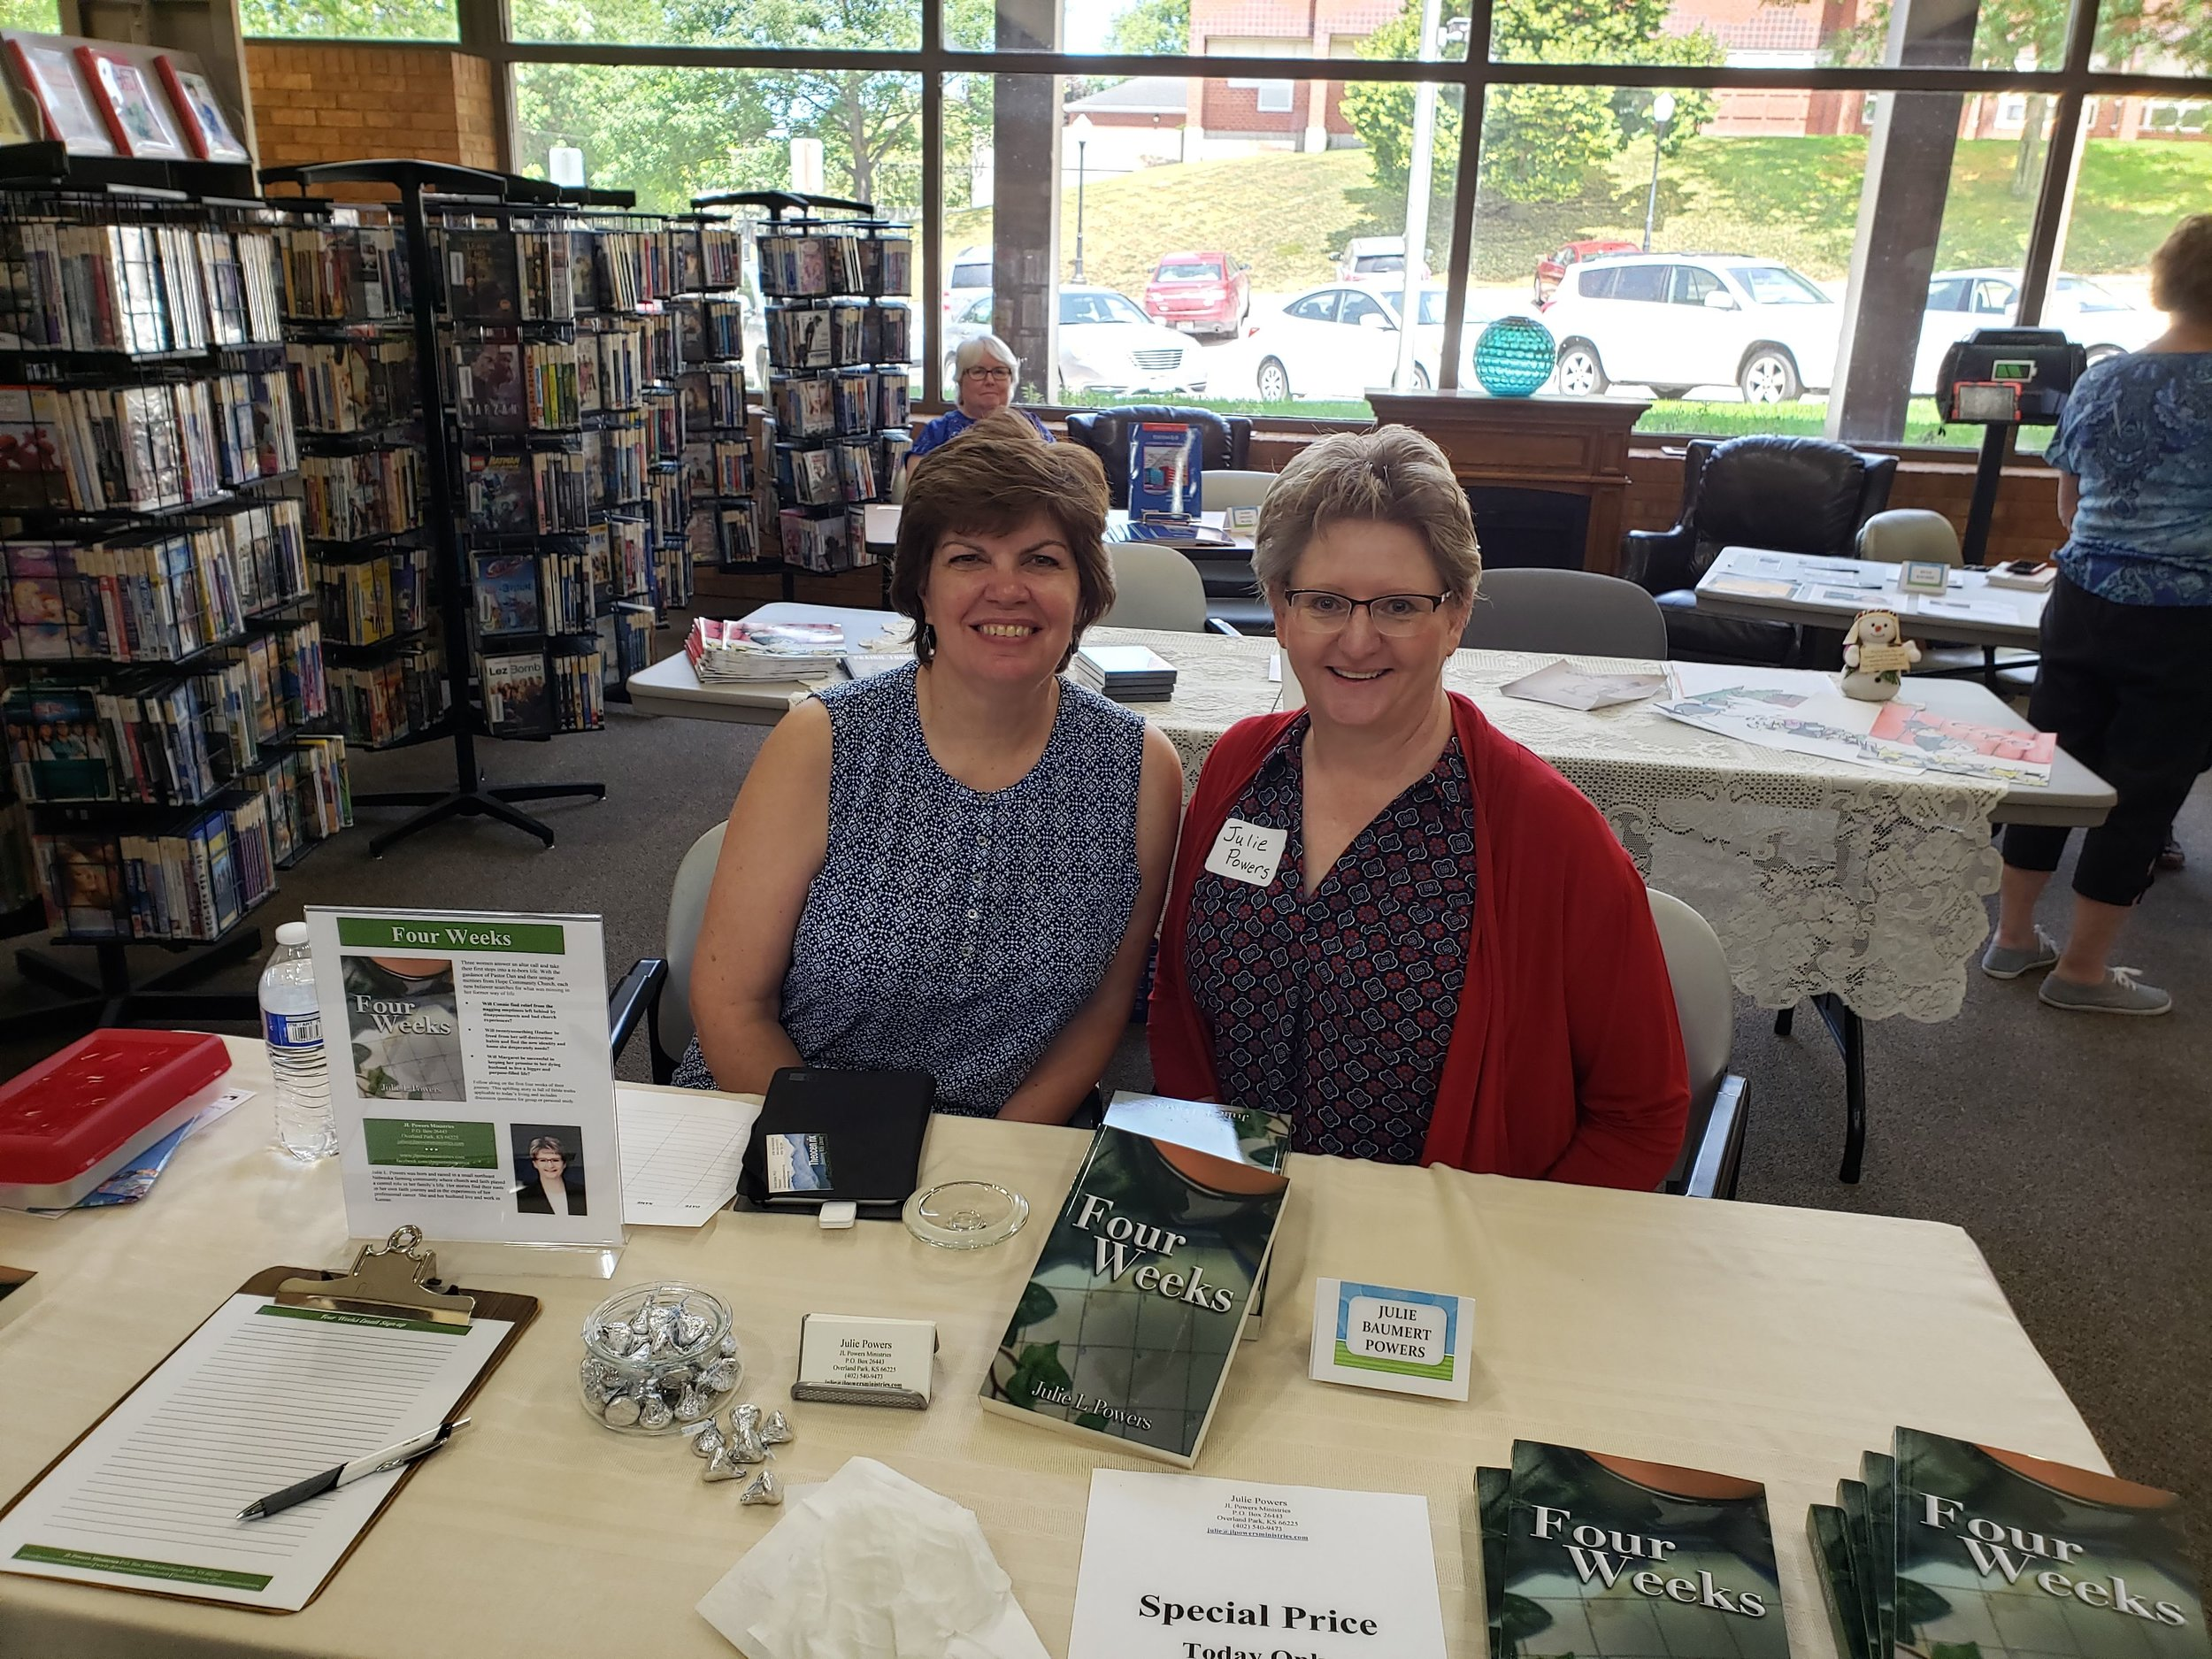 Ann Fenton and Julie Powers